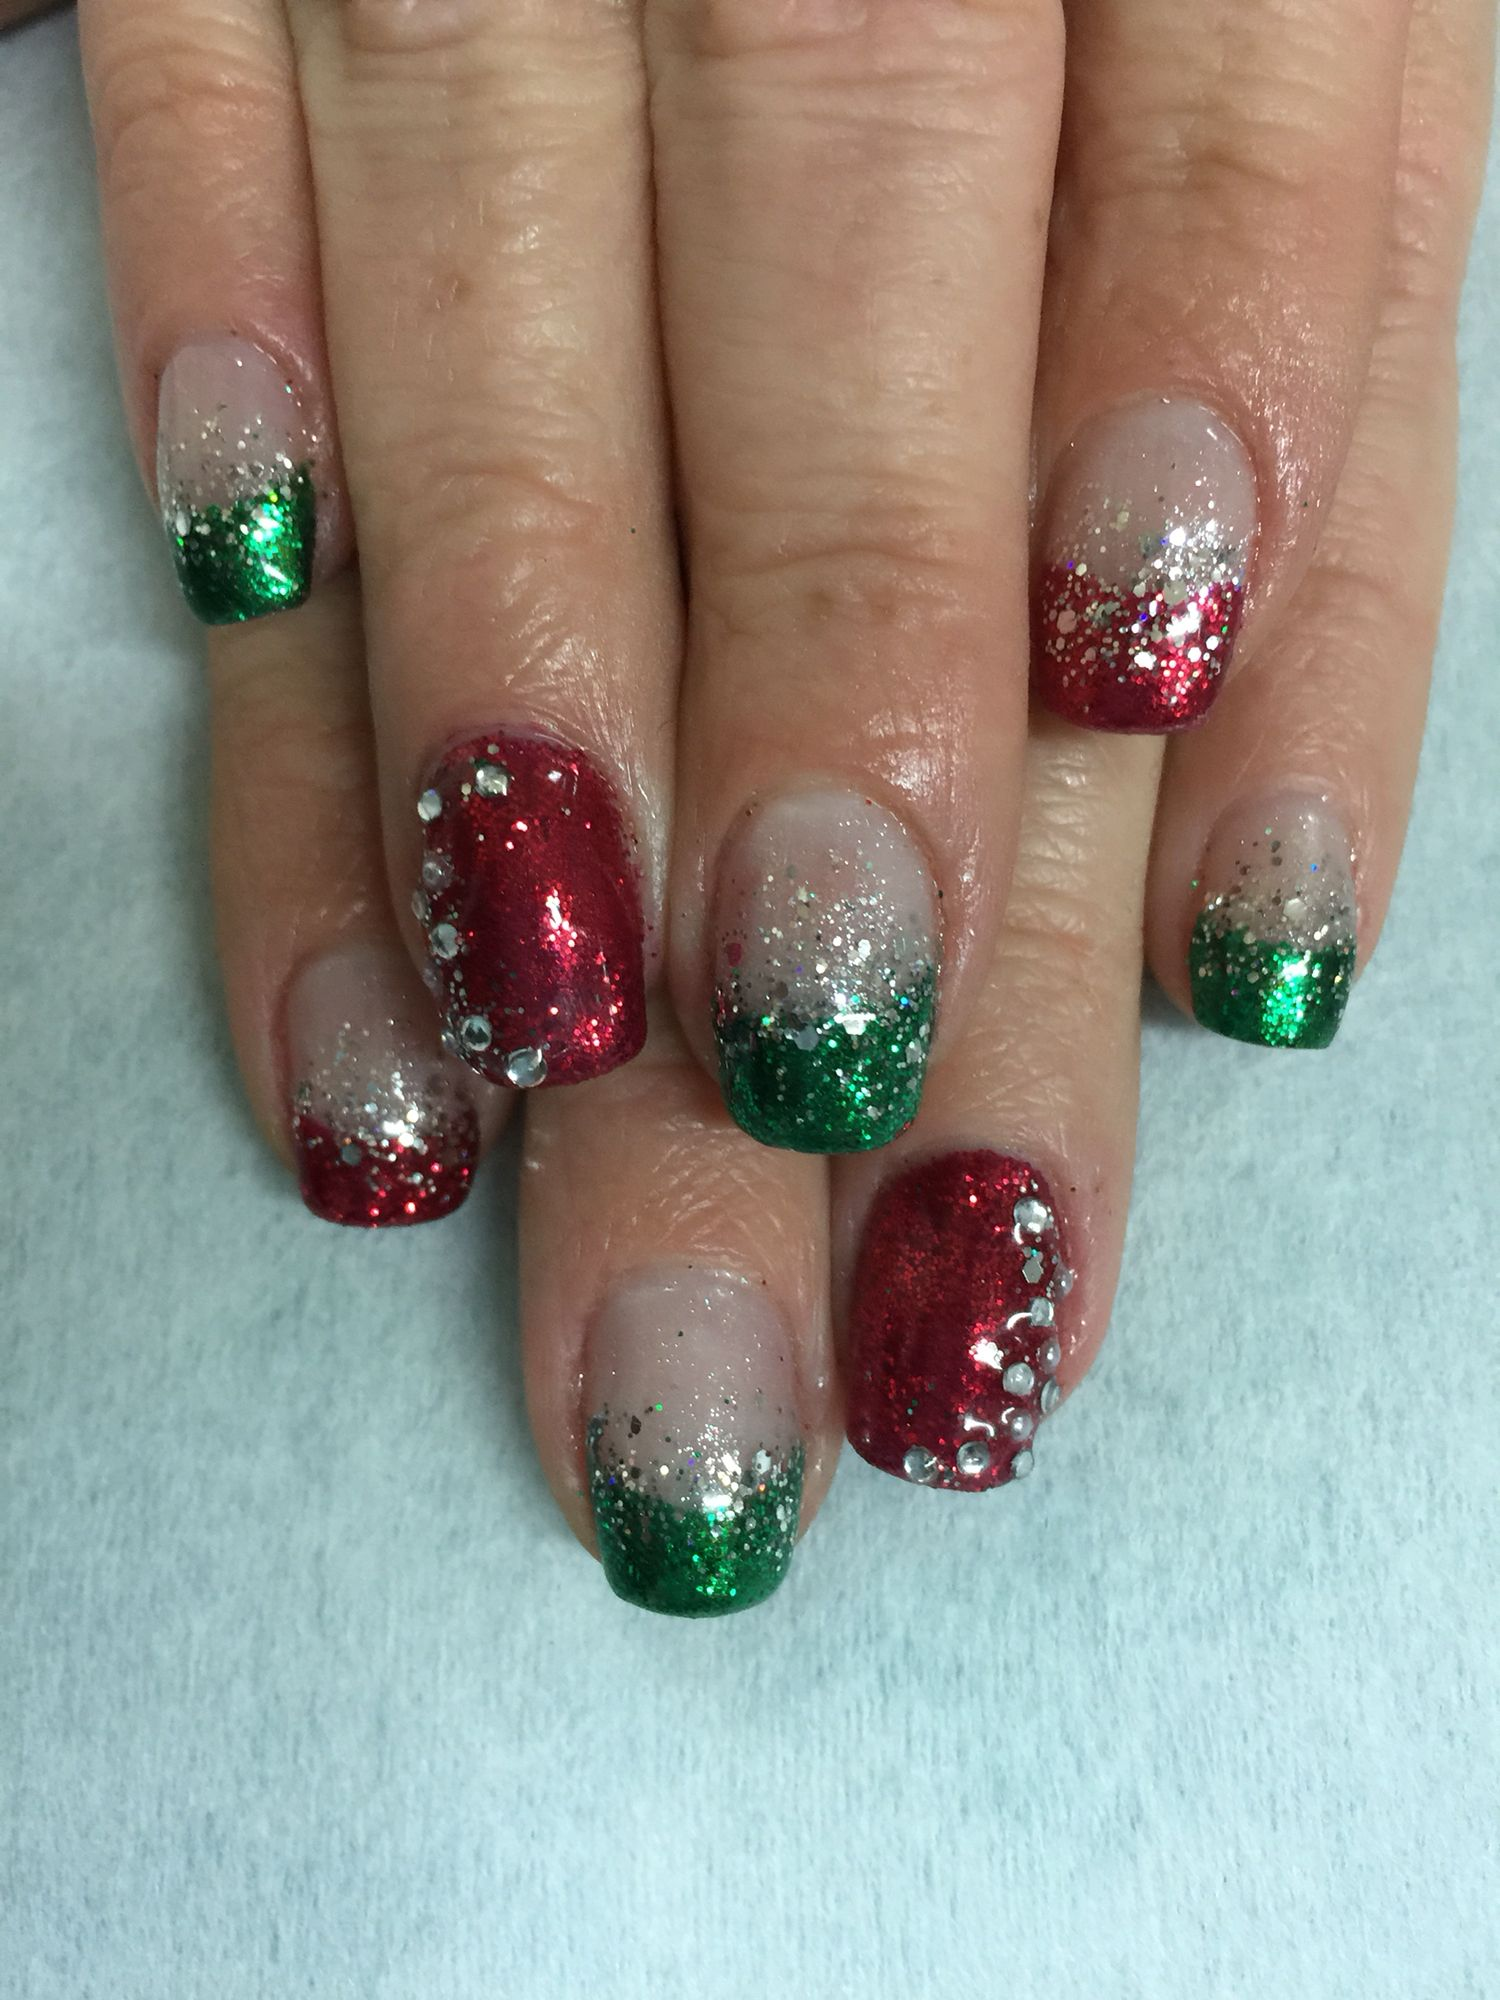 Super Sparkly Christmas Red Green Glitter Gel Polish Over Non Toxic Odorless Hard Gel Gel Nail Designs Green Nail Polish Nails